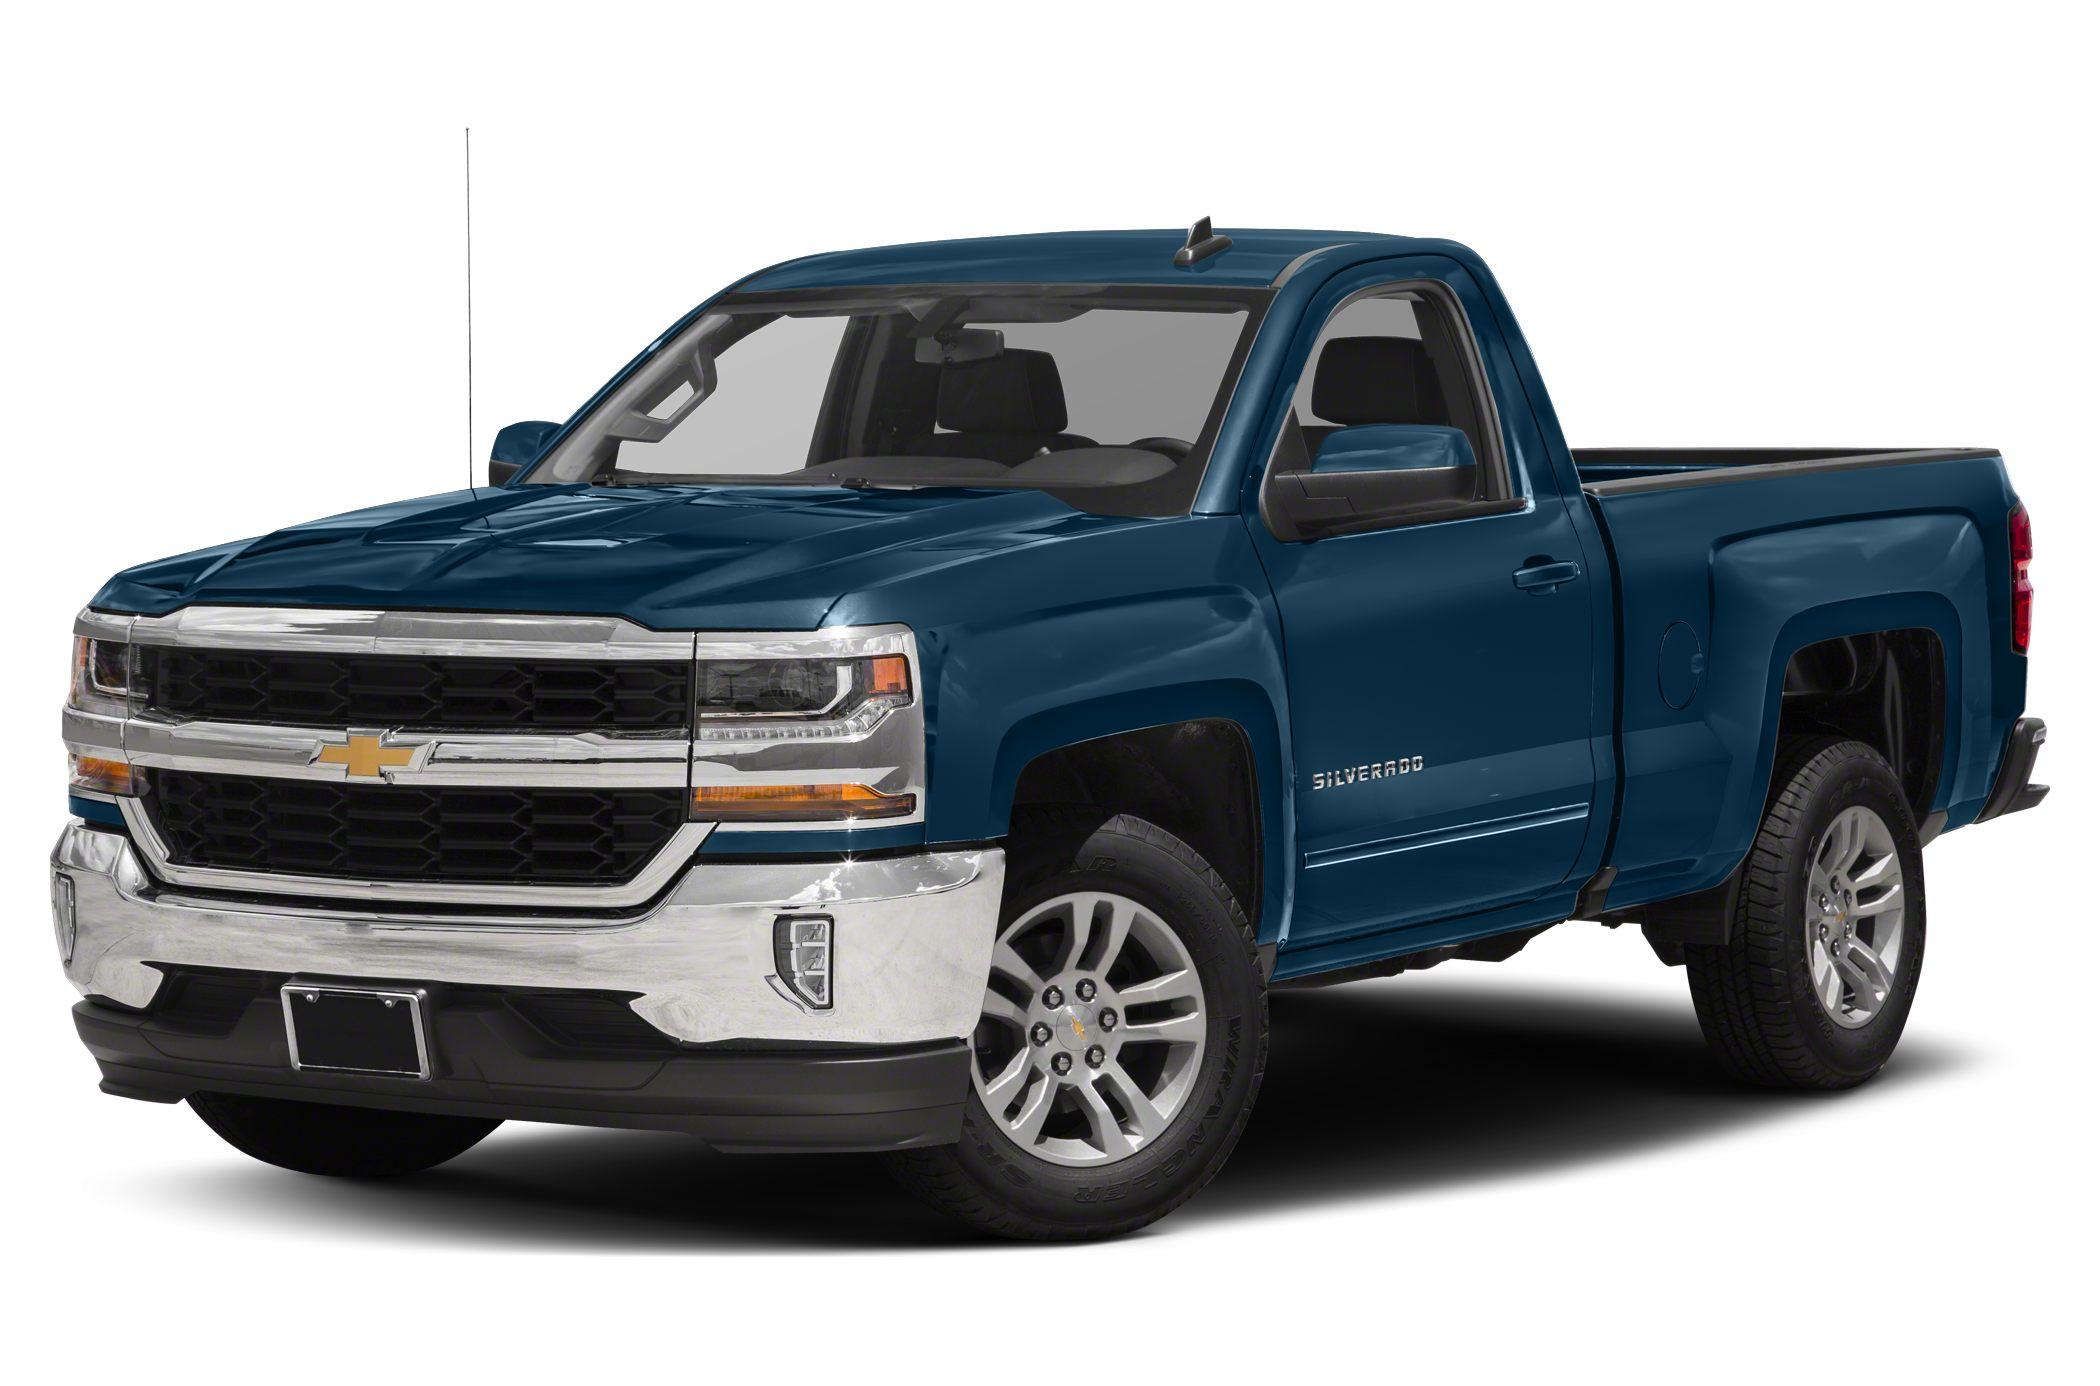 Chevy Silverado Lease Deals >> 2018 Chevrolet Silverado 1500 Pictures & Photos - CarsDirect